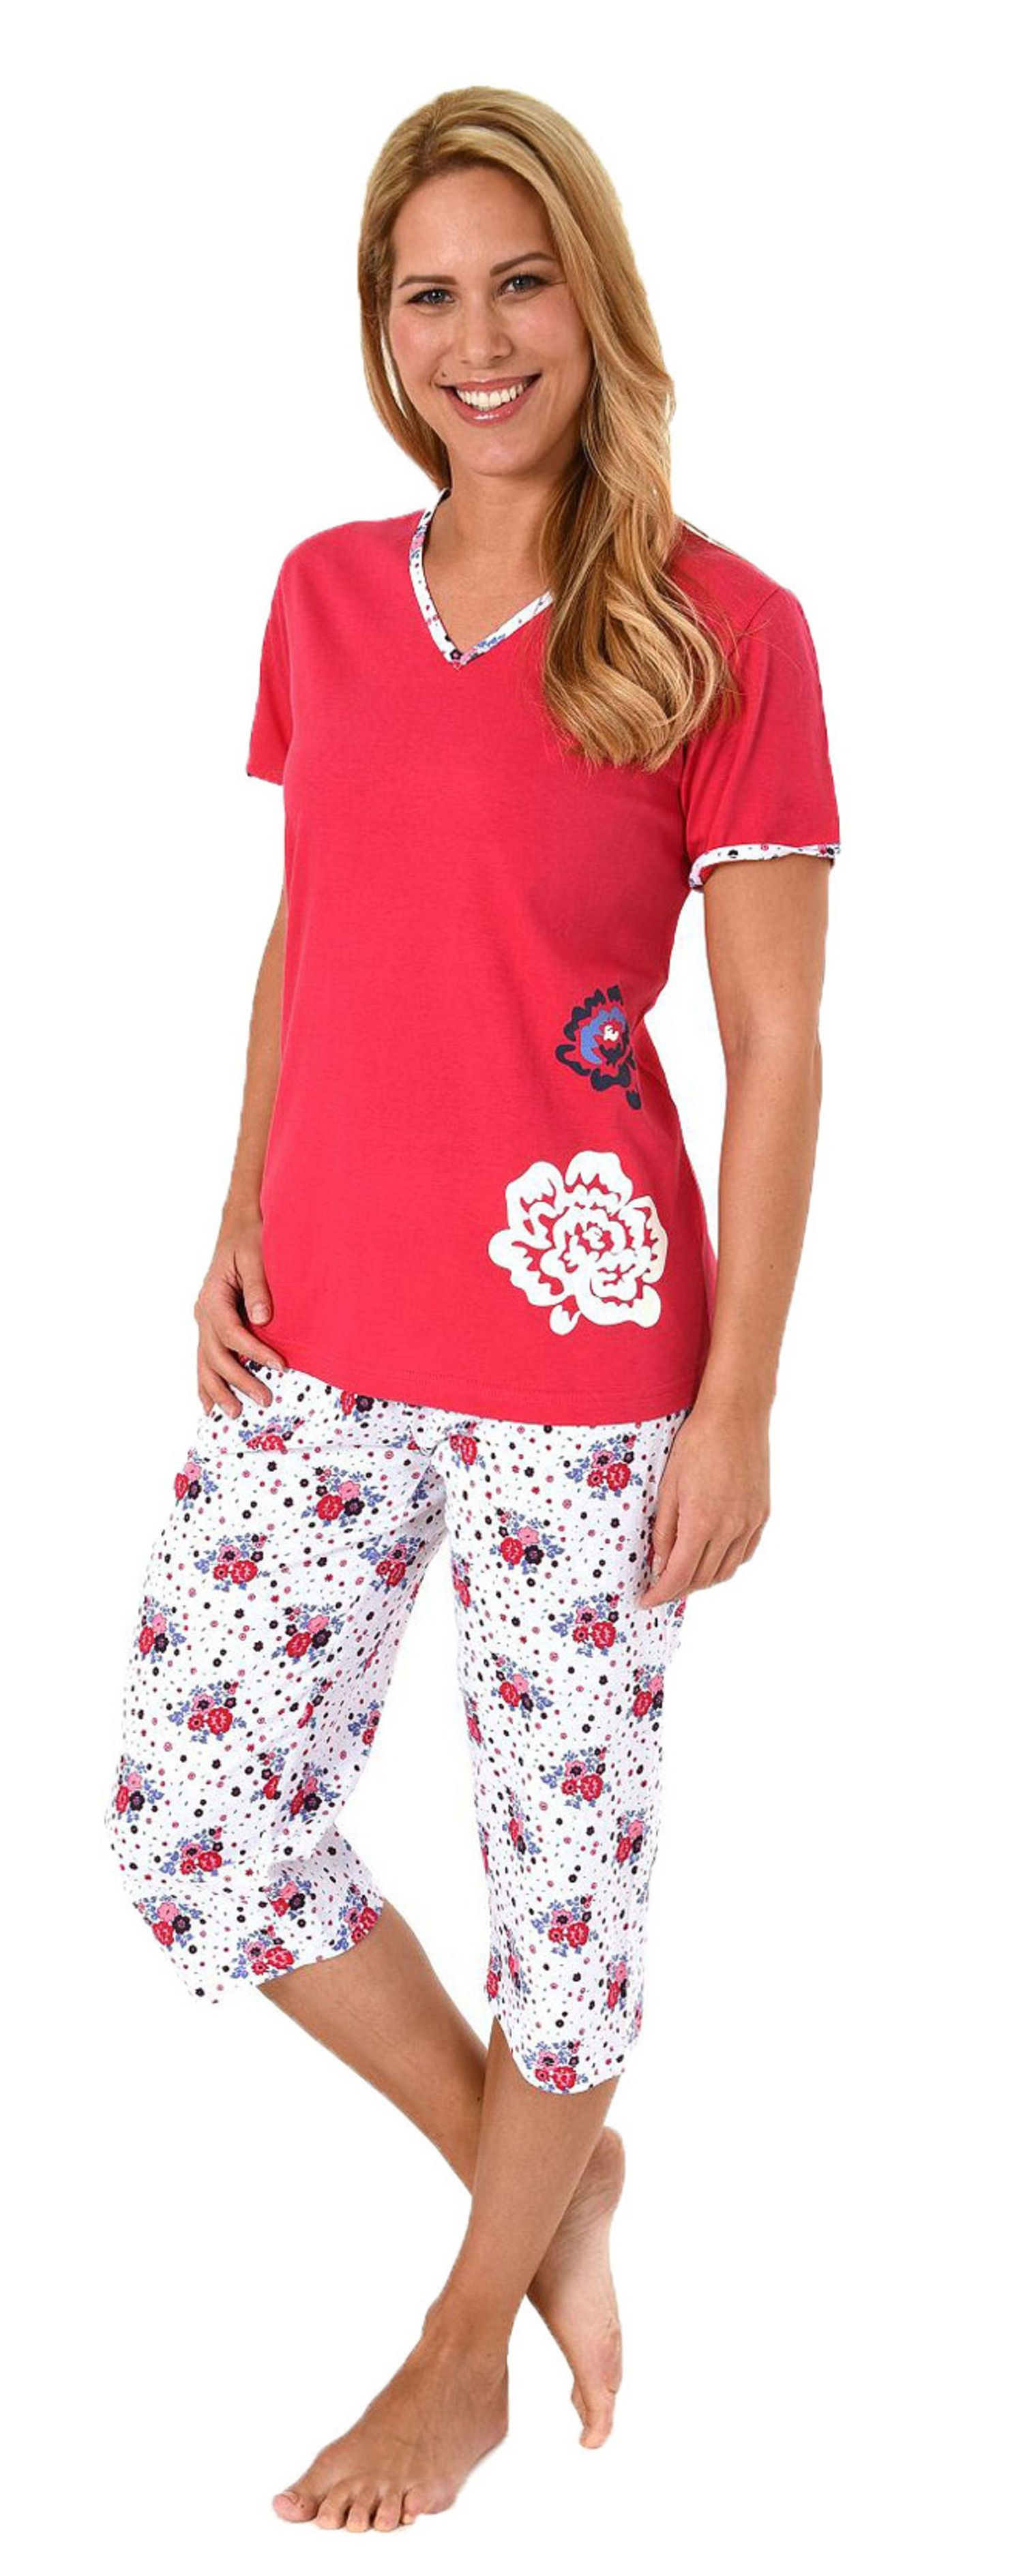 Damen Capri Pyjama kurzarm Schlafanzug mit 3/4-langer Hose, Blume als Motivprint – 60848 – Bild 1